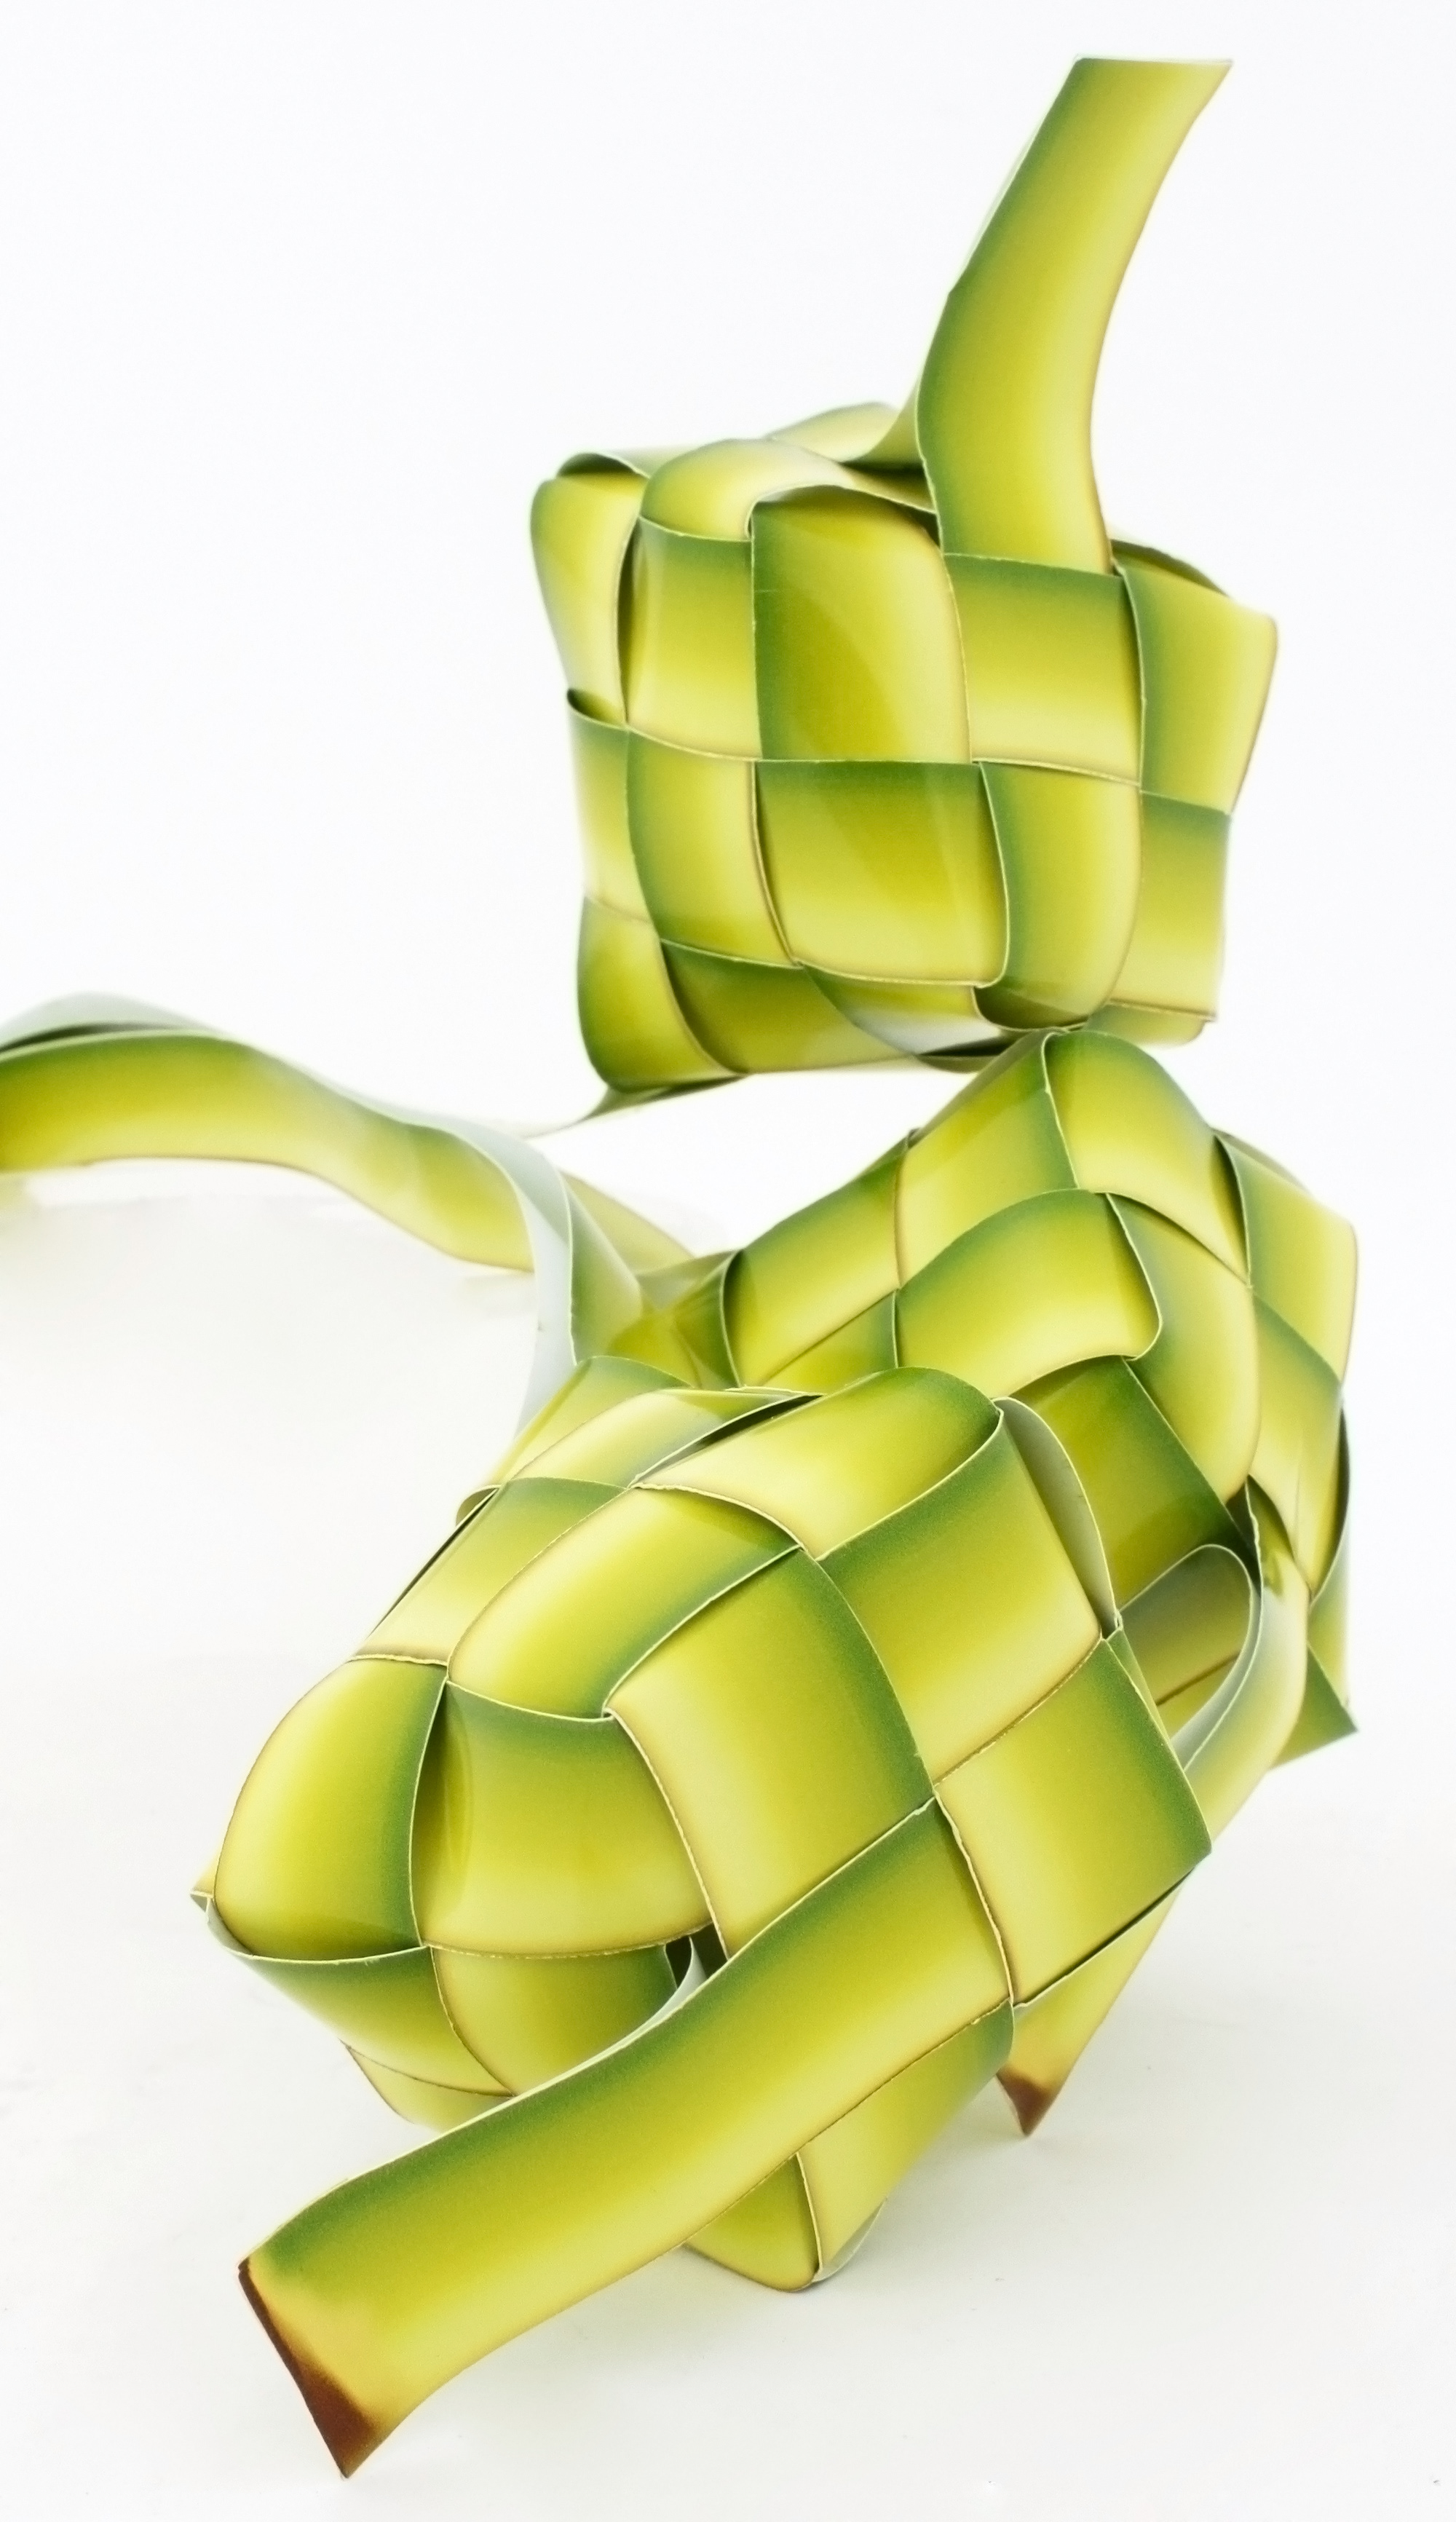 File:Drawing of three ketupat - 01.jpg - Wikimedia Commons